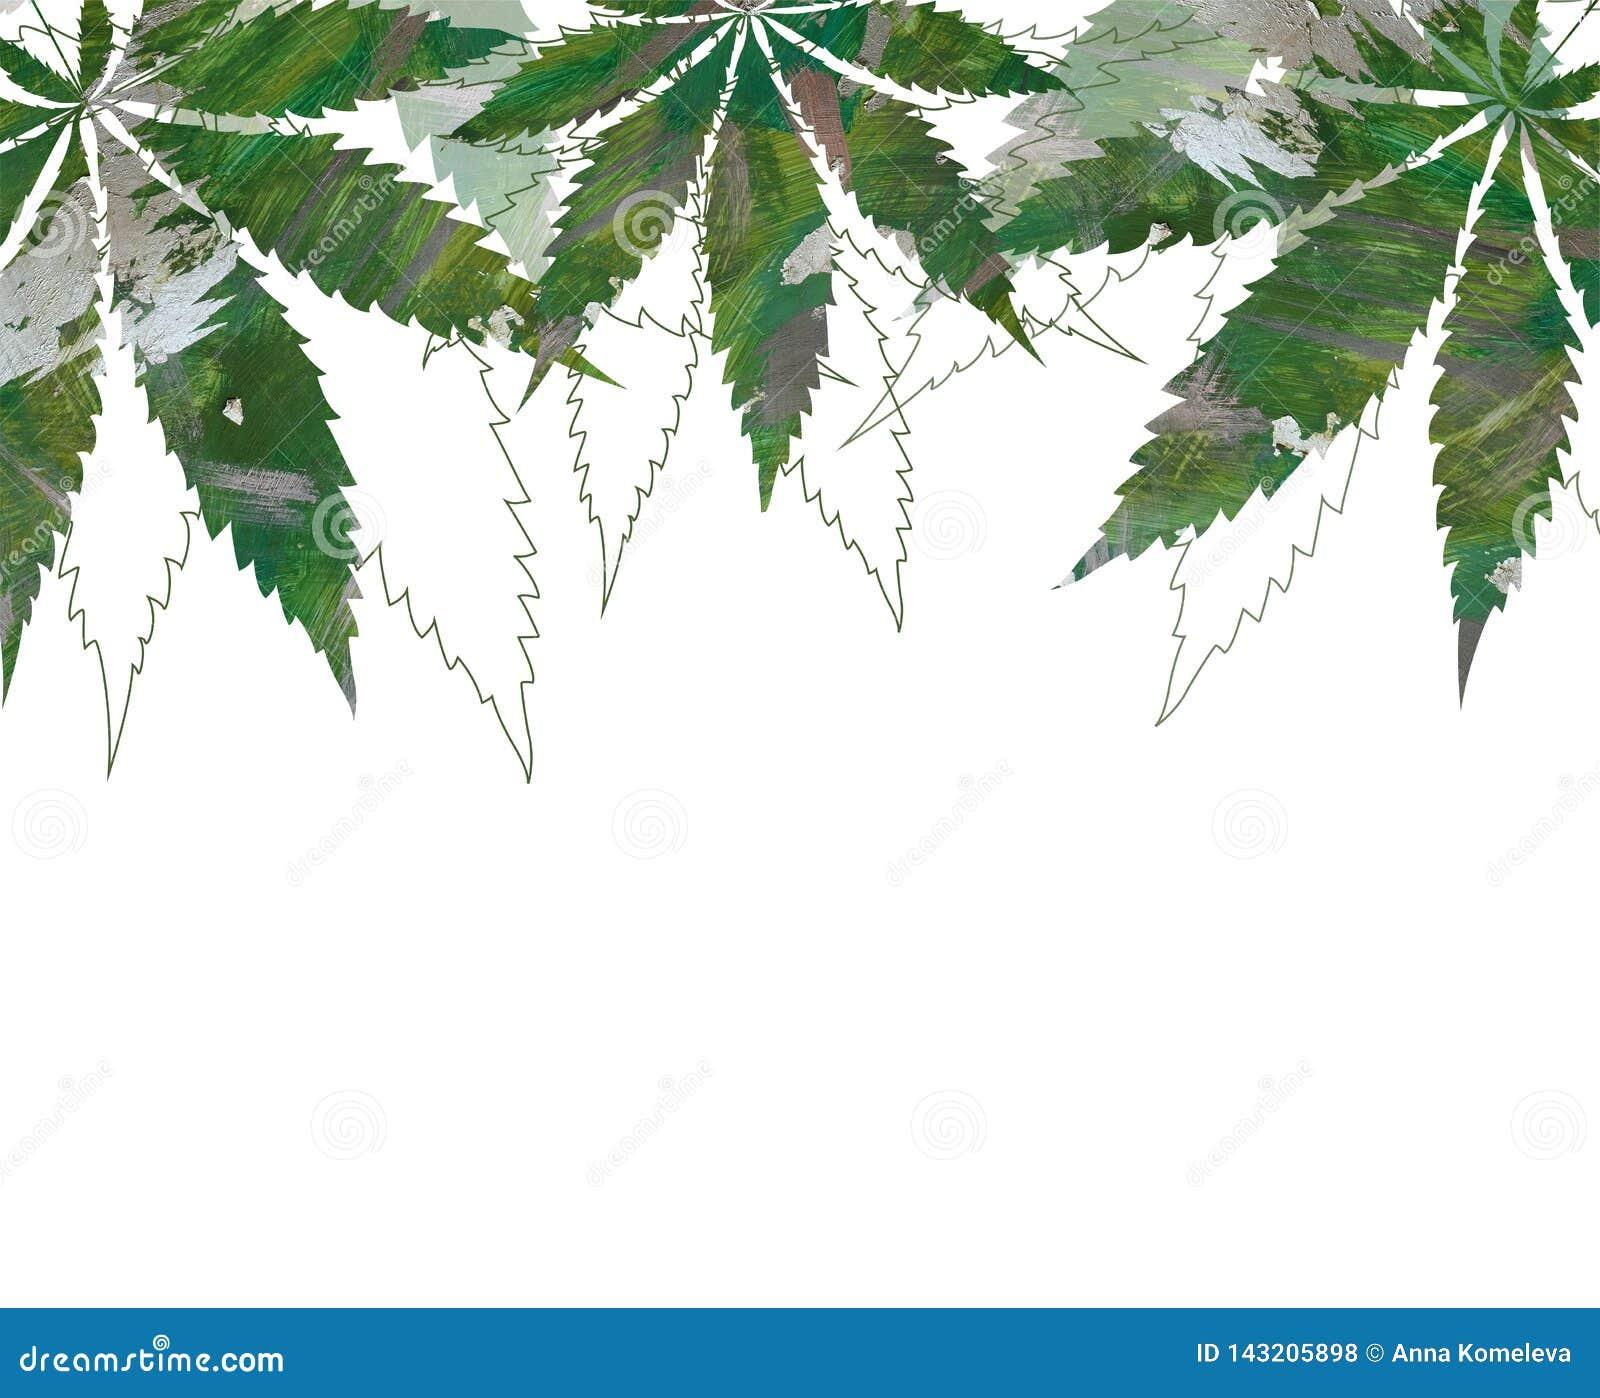 Karta, szablon, sztandar ręki liście konopiane marihuany rysunek